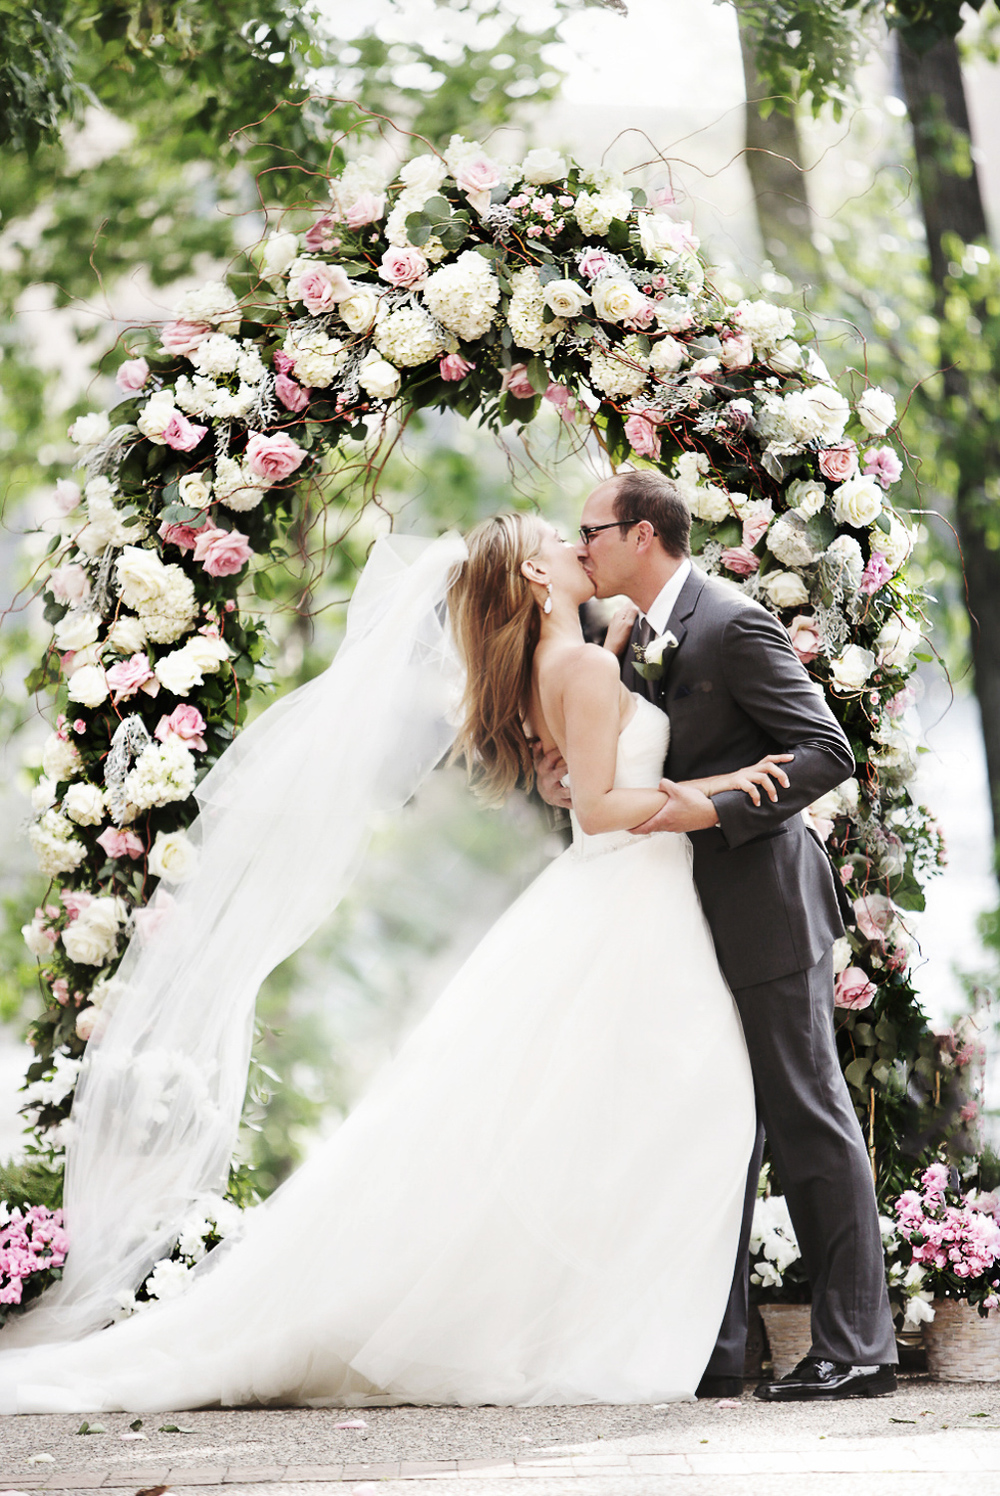 clewell minneapolis wedding photographer-24731249227395426.jpg